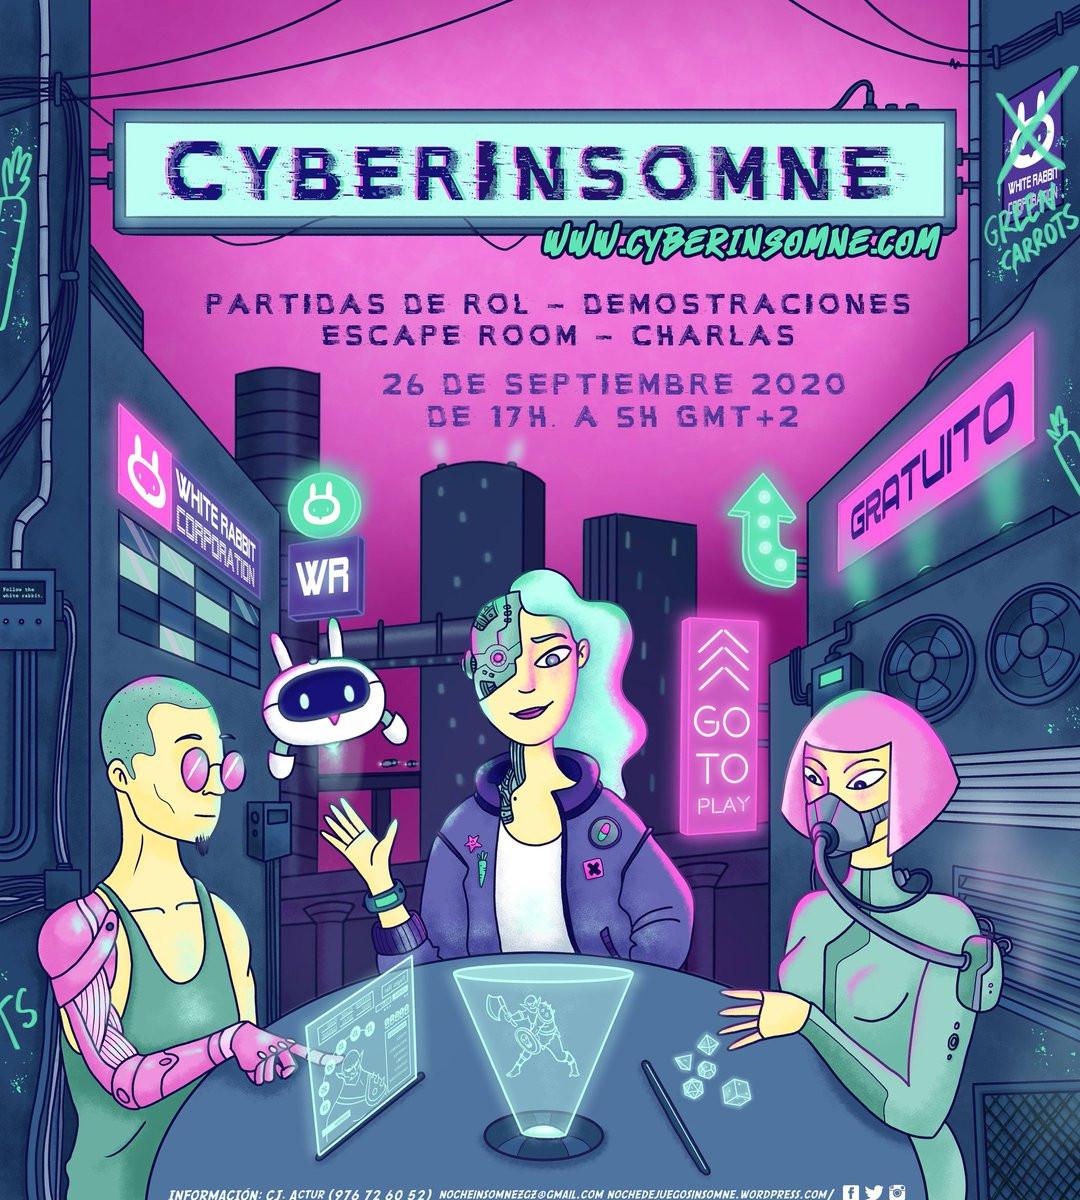 NOCHE INSOMNE 2020 (CyberInsomne)